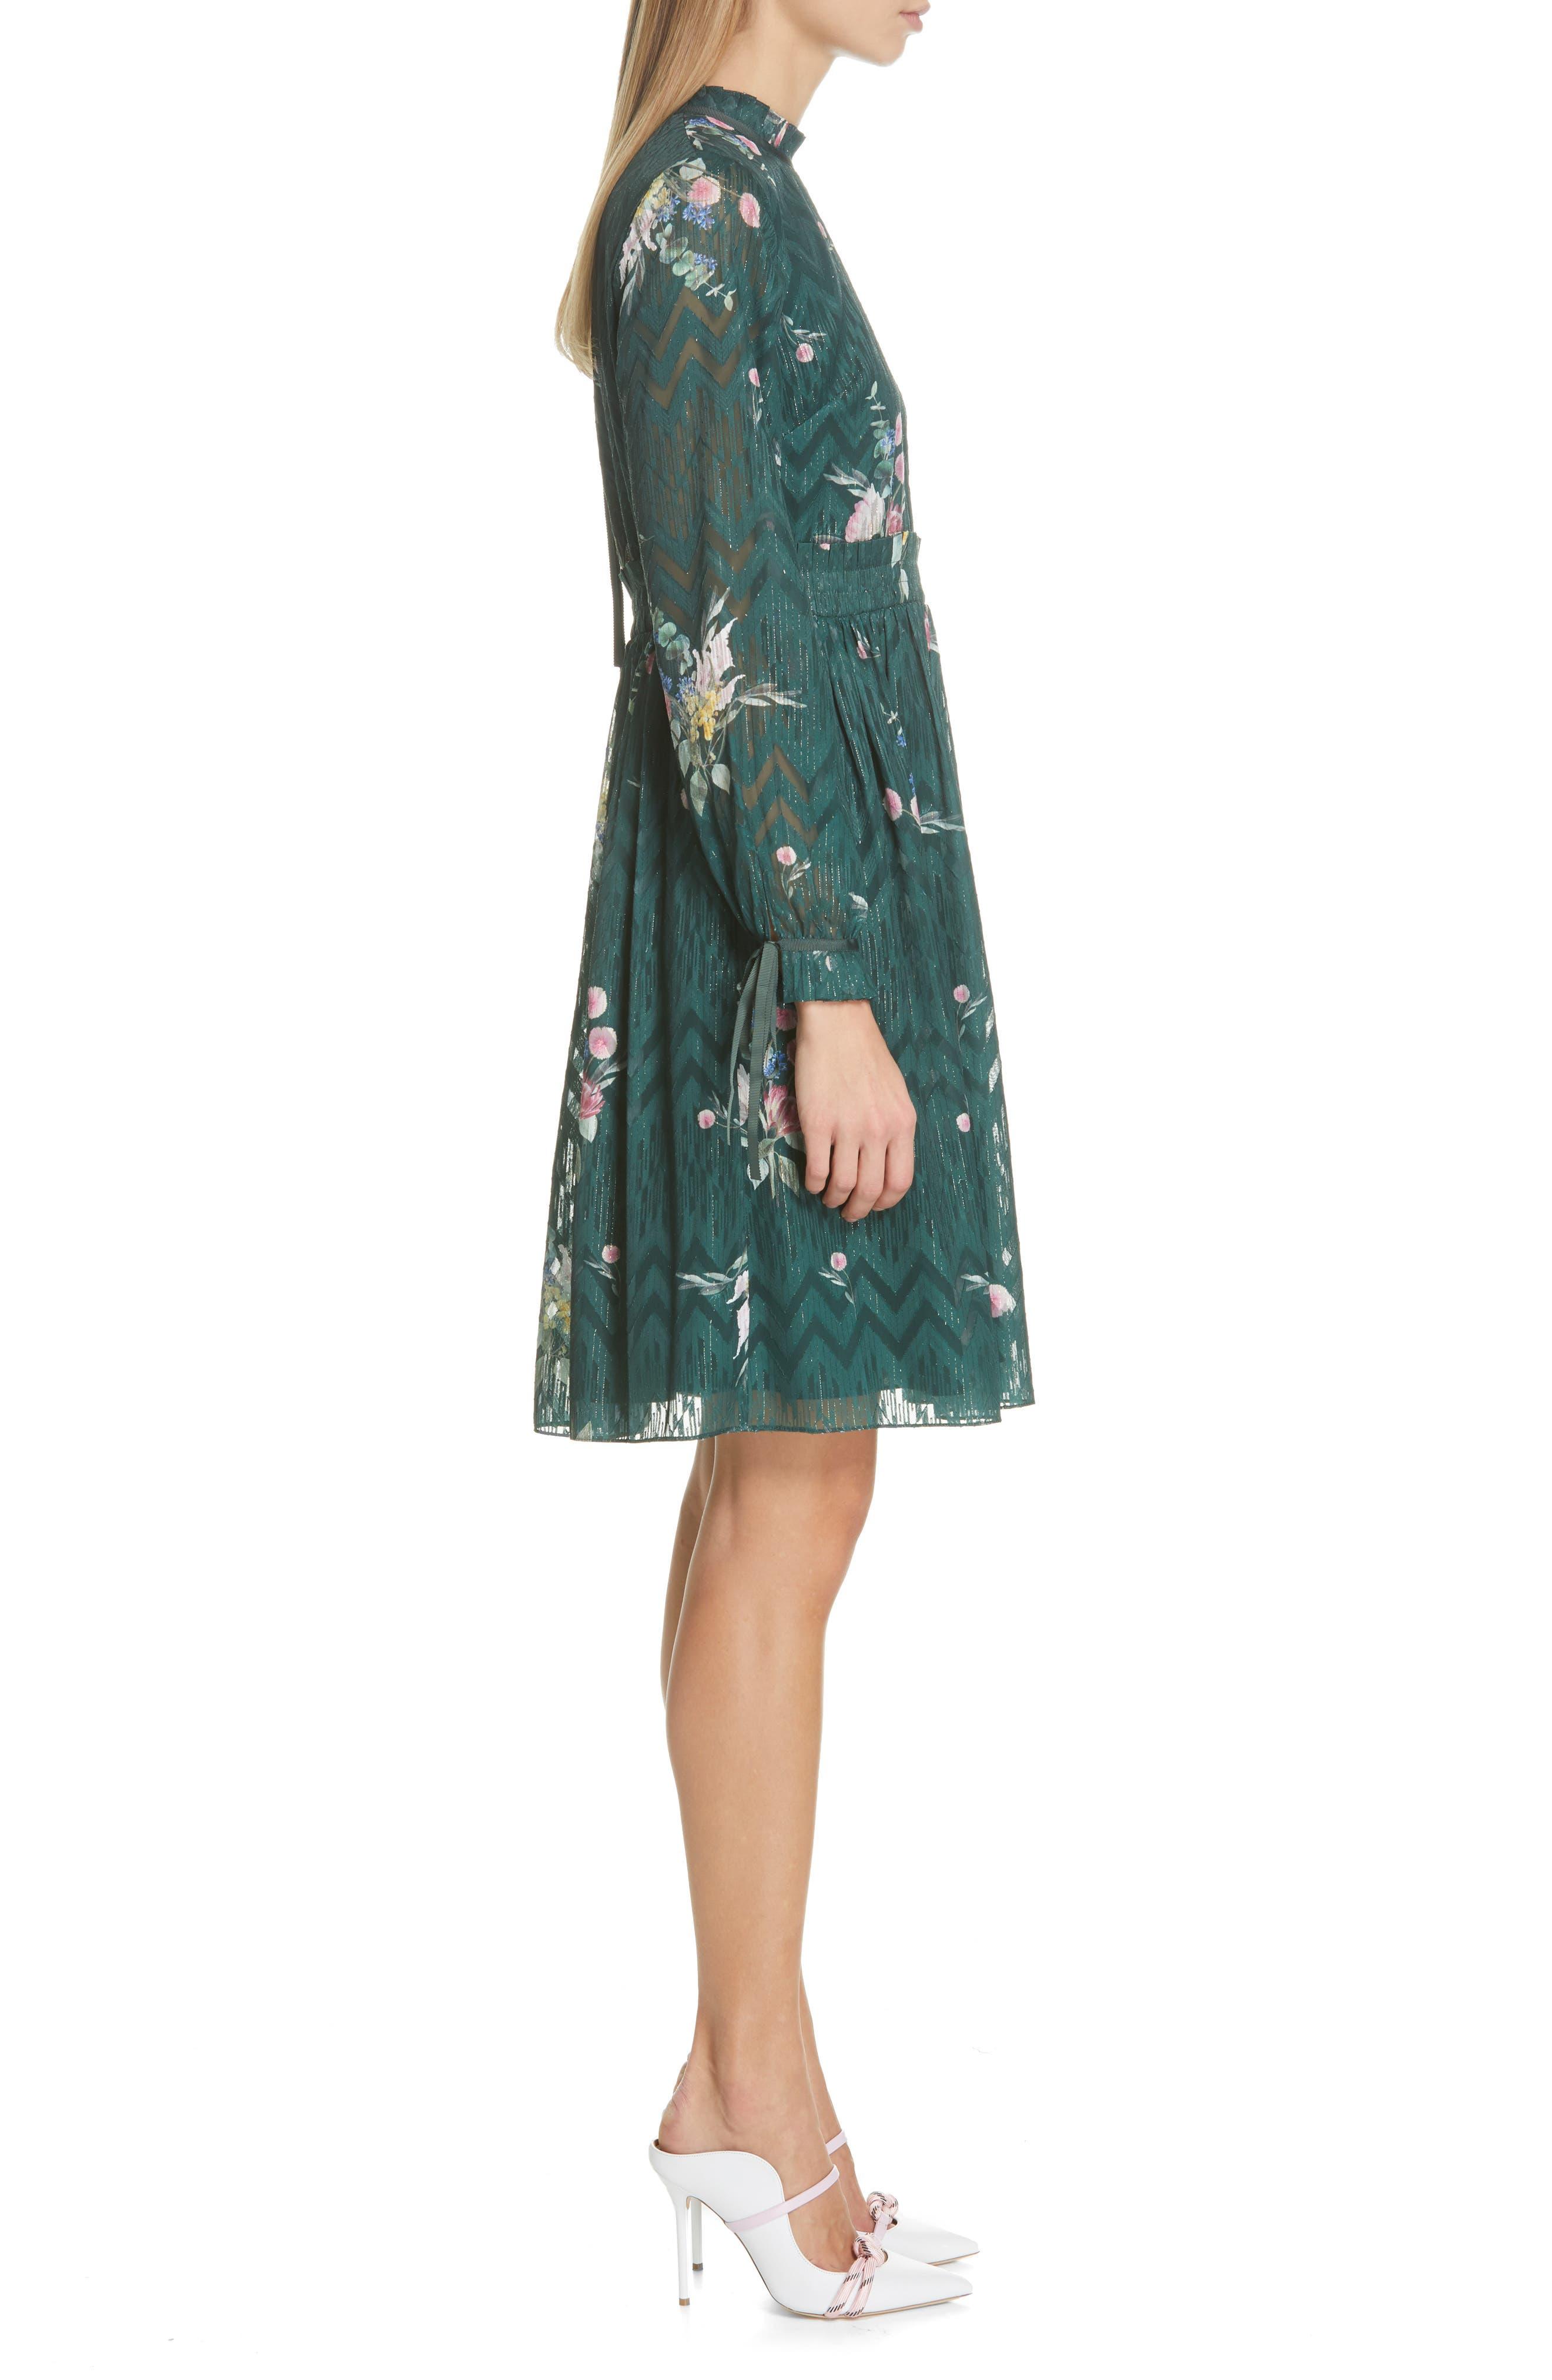 TED BAKER LONDON, Sofiya Floral Ribbon Tie Dress, Alternate thumbnail 4, color, DARK GREEN